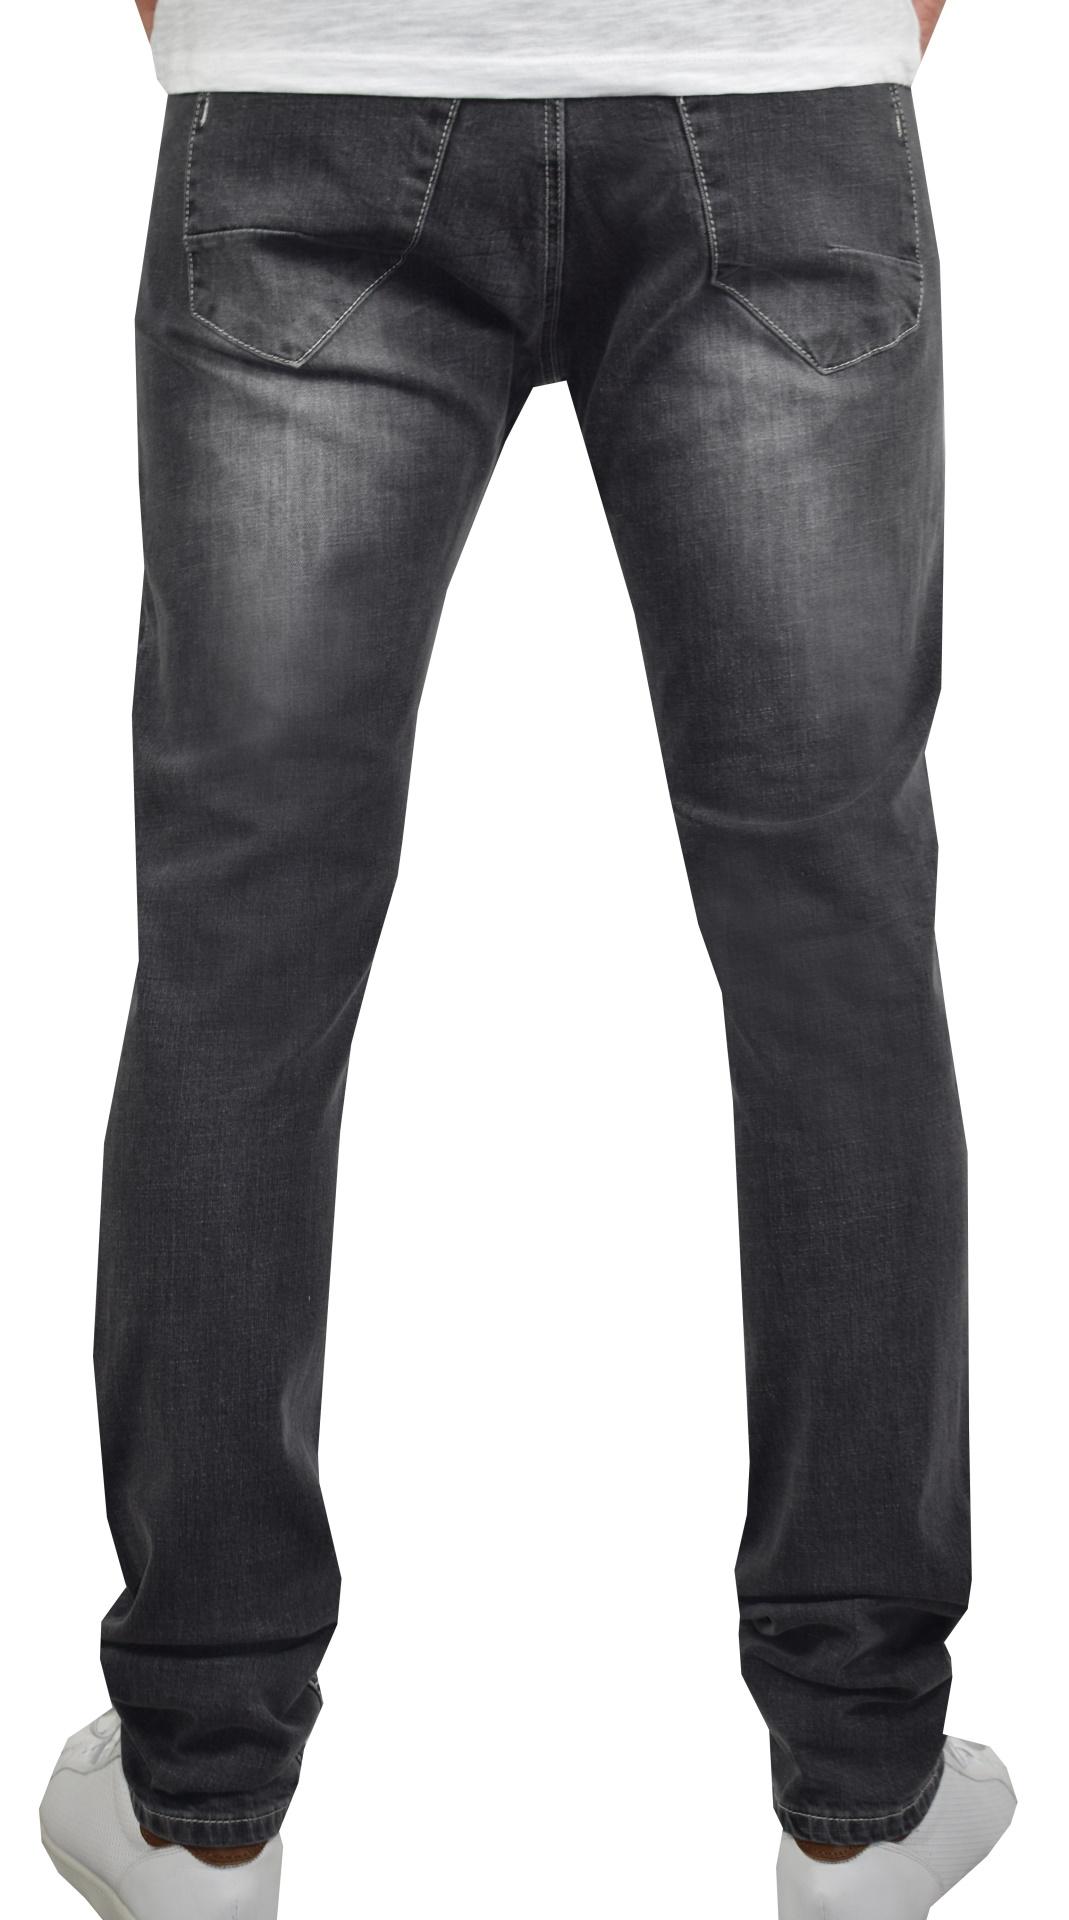 LEO JEANS UOMO 5 TASCHE GRIGIO CHIARO 1 1st american jeans fashion 5 tasche uomo colore grigio chiaro - 99% cotton 1% elastan denim 1150 oz